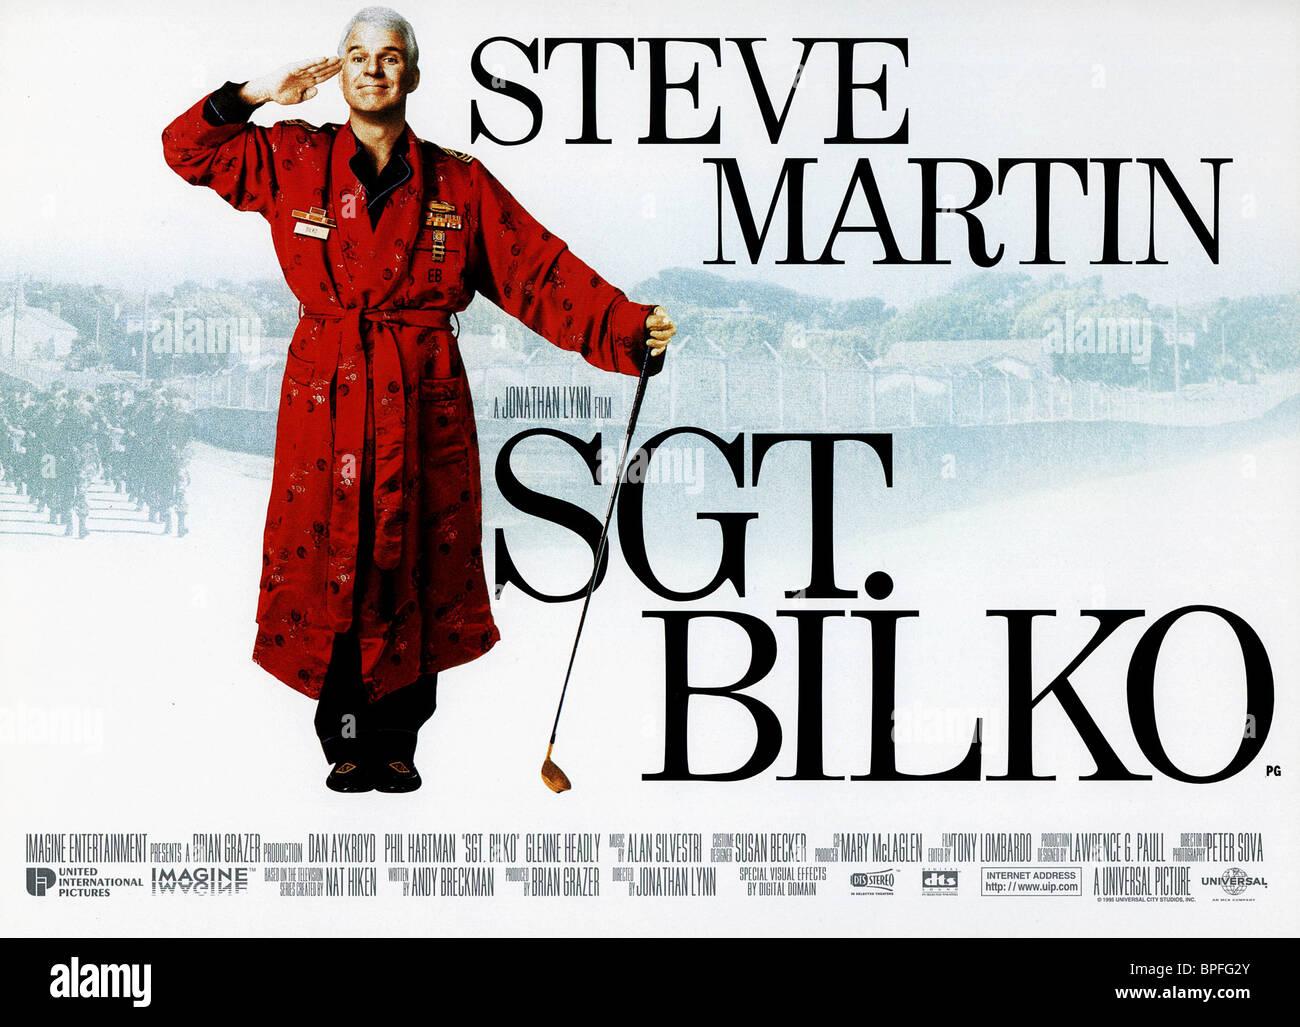 STEVE MARTIN SGT. BILKO (1996) - Stock Image